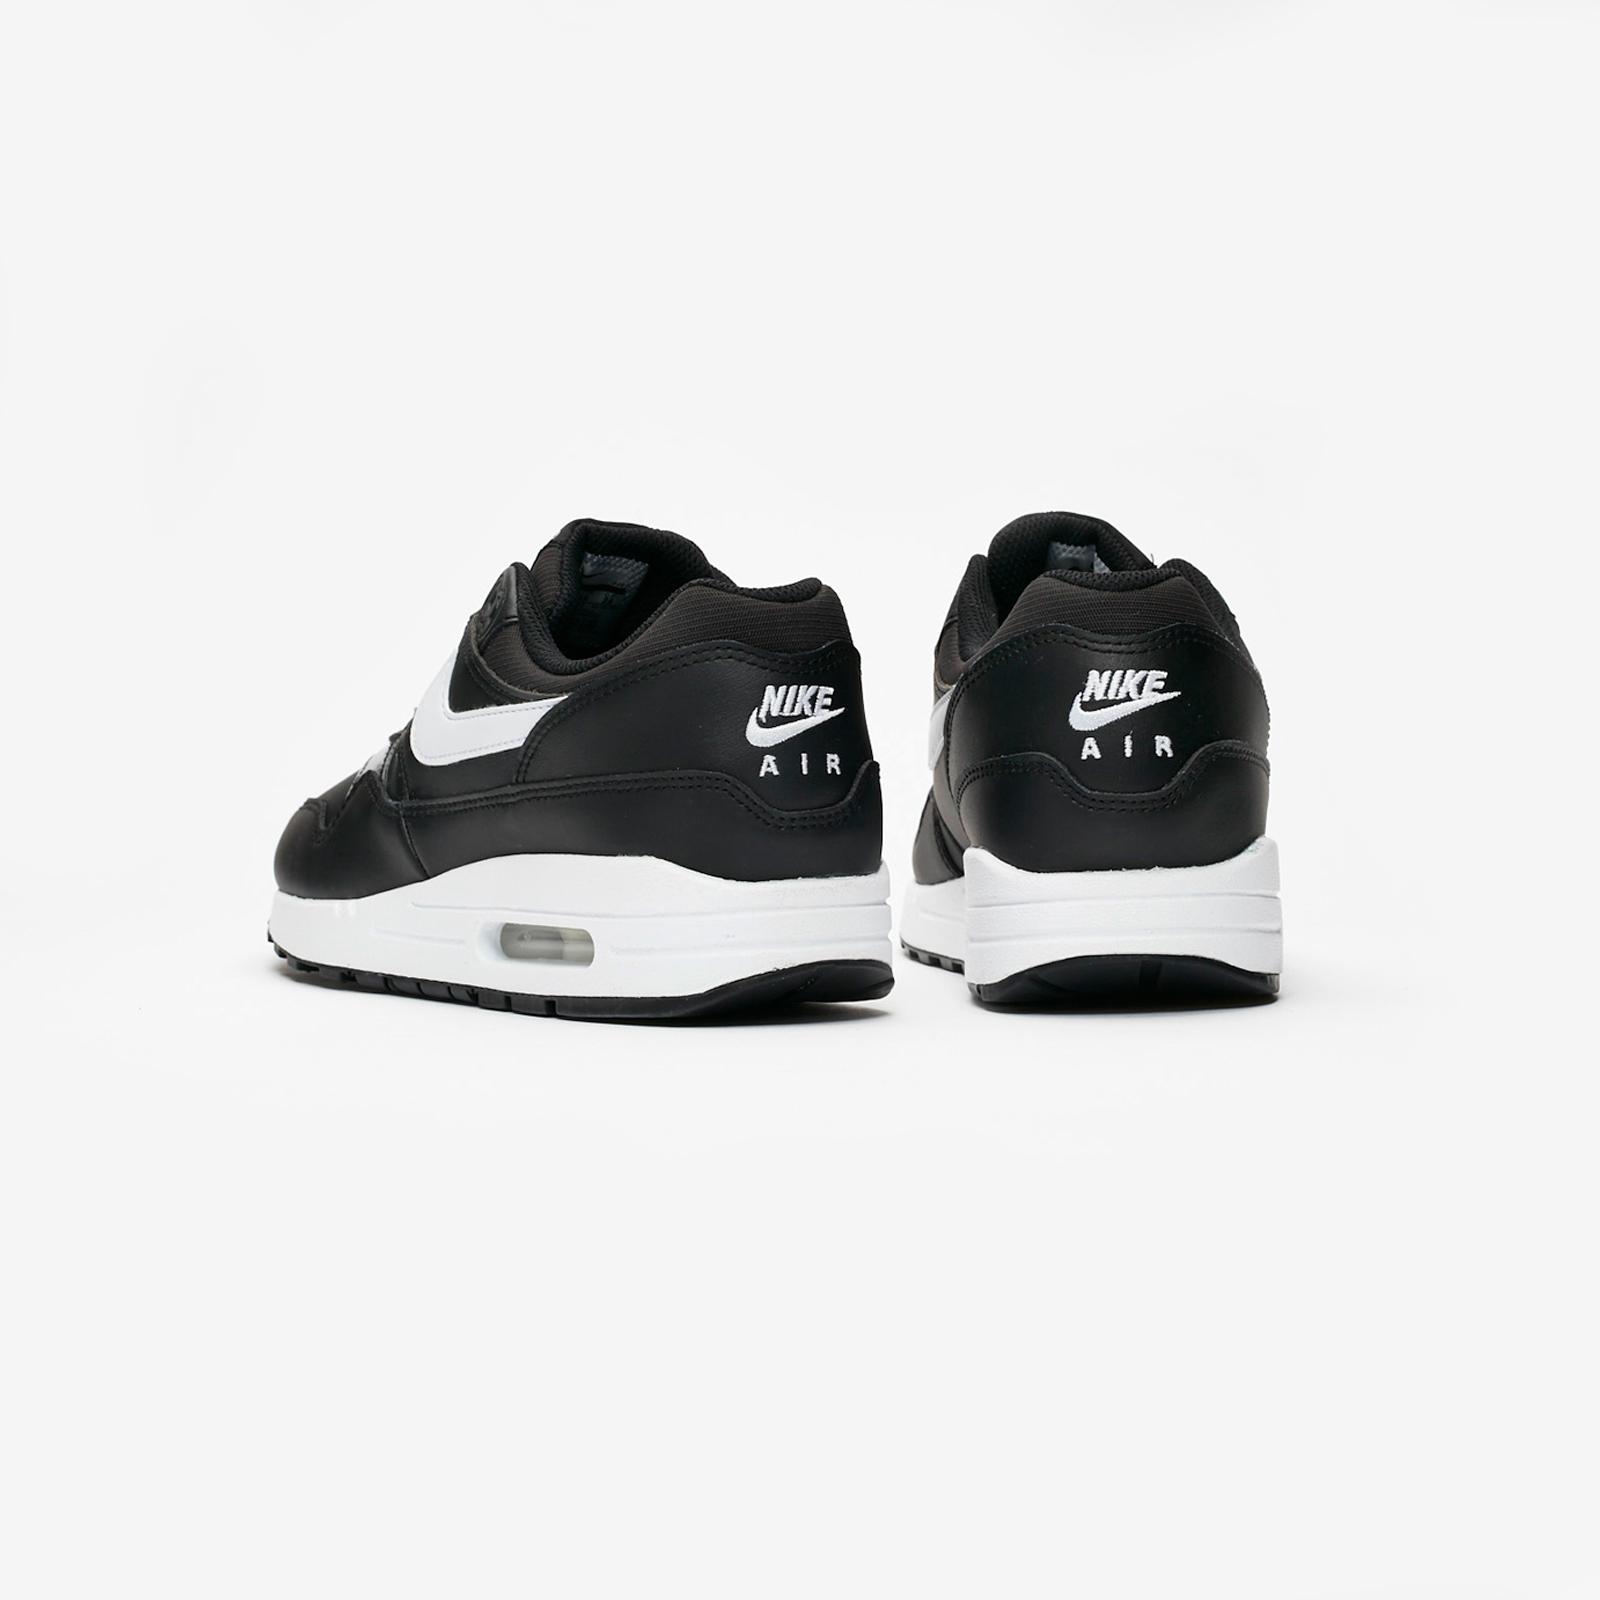 wholesale dealer 4e041 67e0a Nike Wmns Air Max 1 - 319986-044 - Sneakersnstuff   sneakers   streetwear  online since 1999